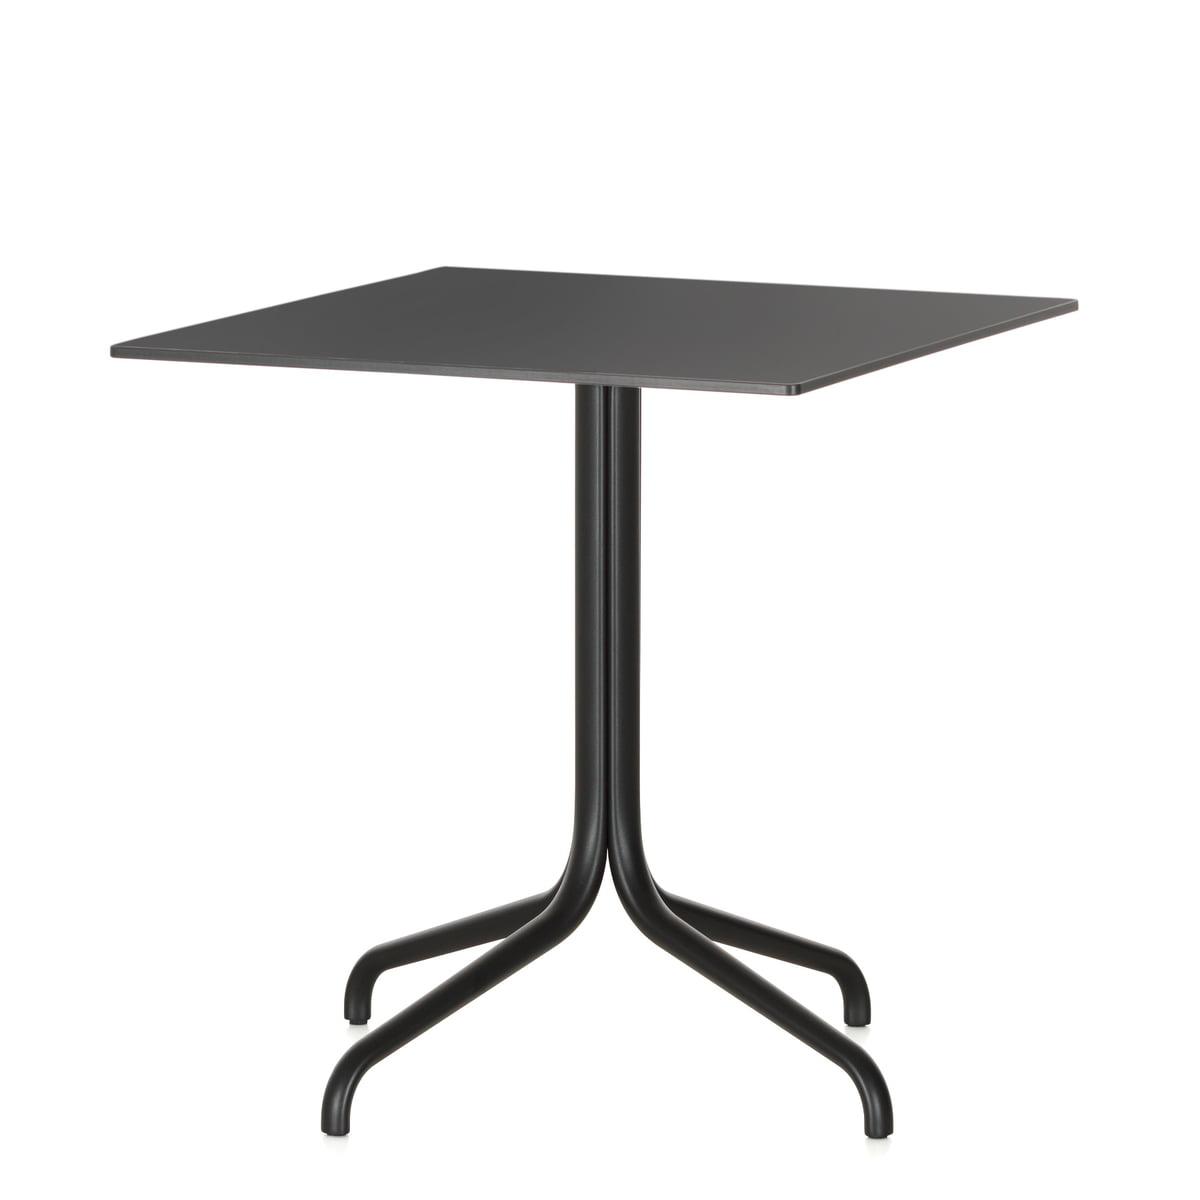 Table de bistrot outdoor belleville vitra - Table de bistrot carree ...